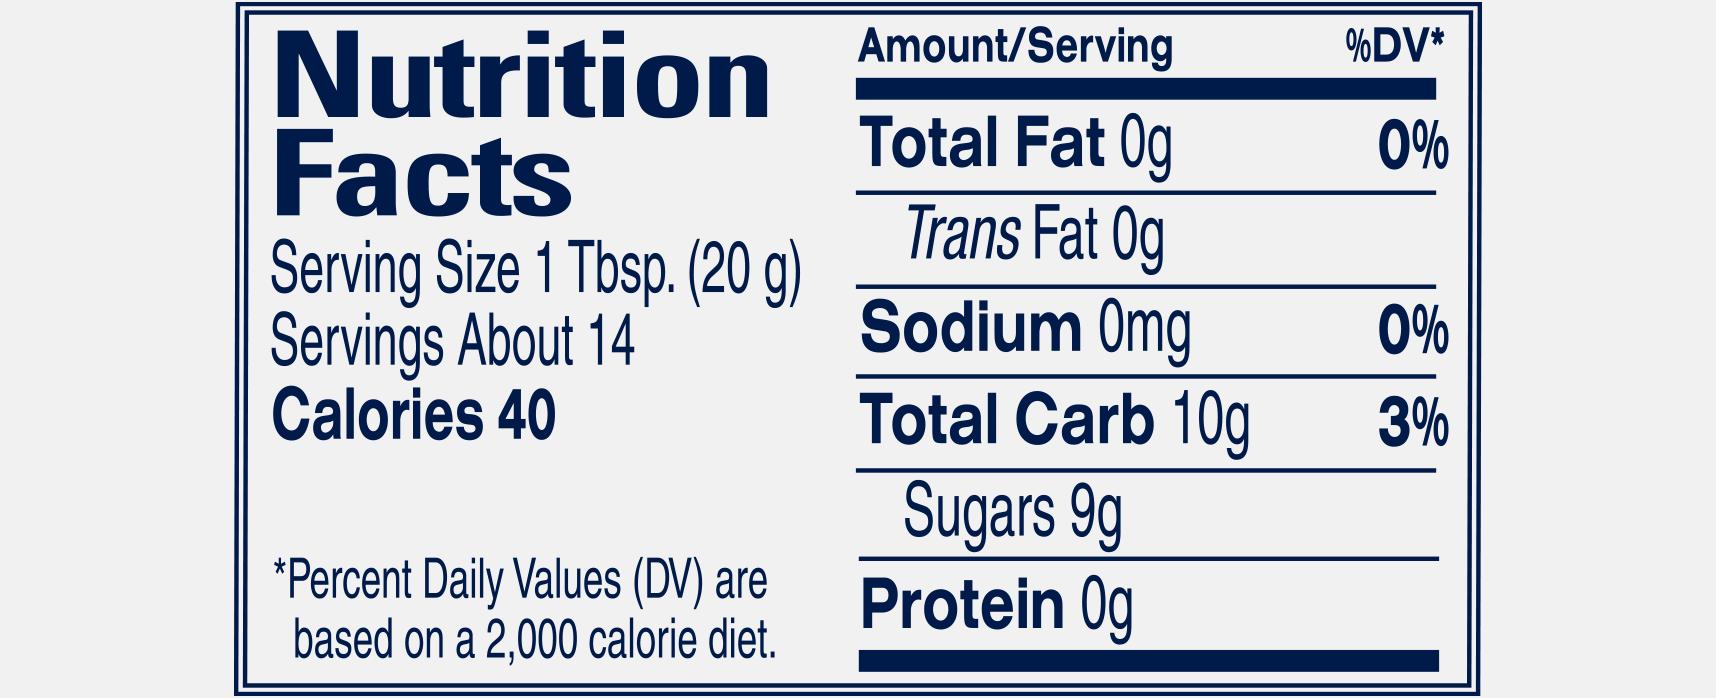 StDalfour_NutritionFacts_BlackCherry.png